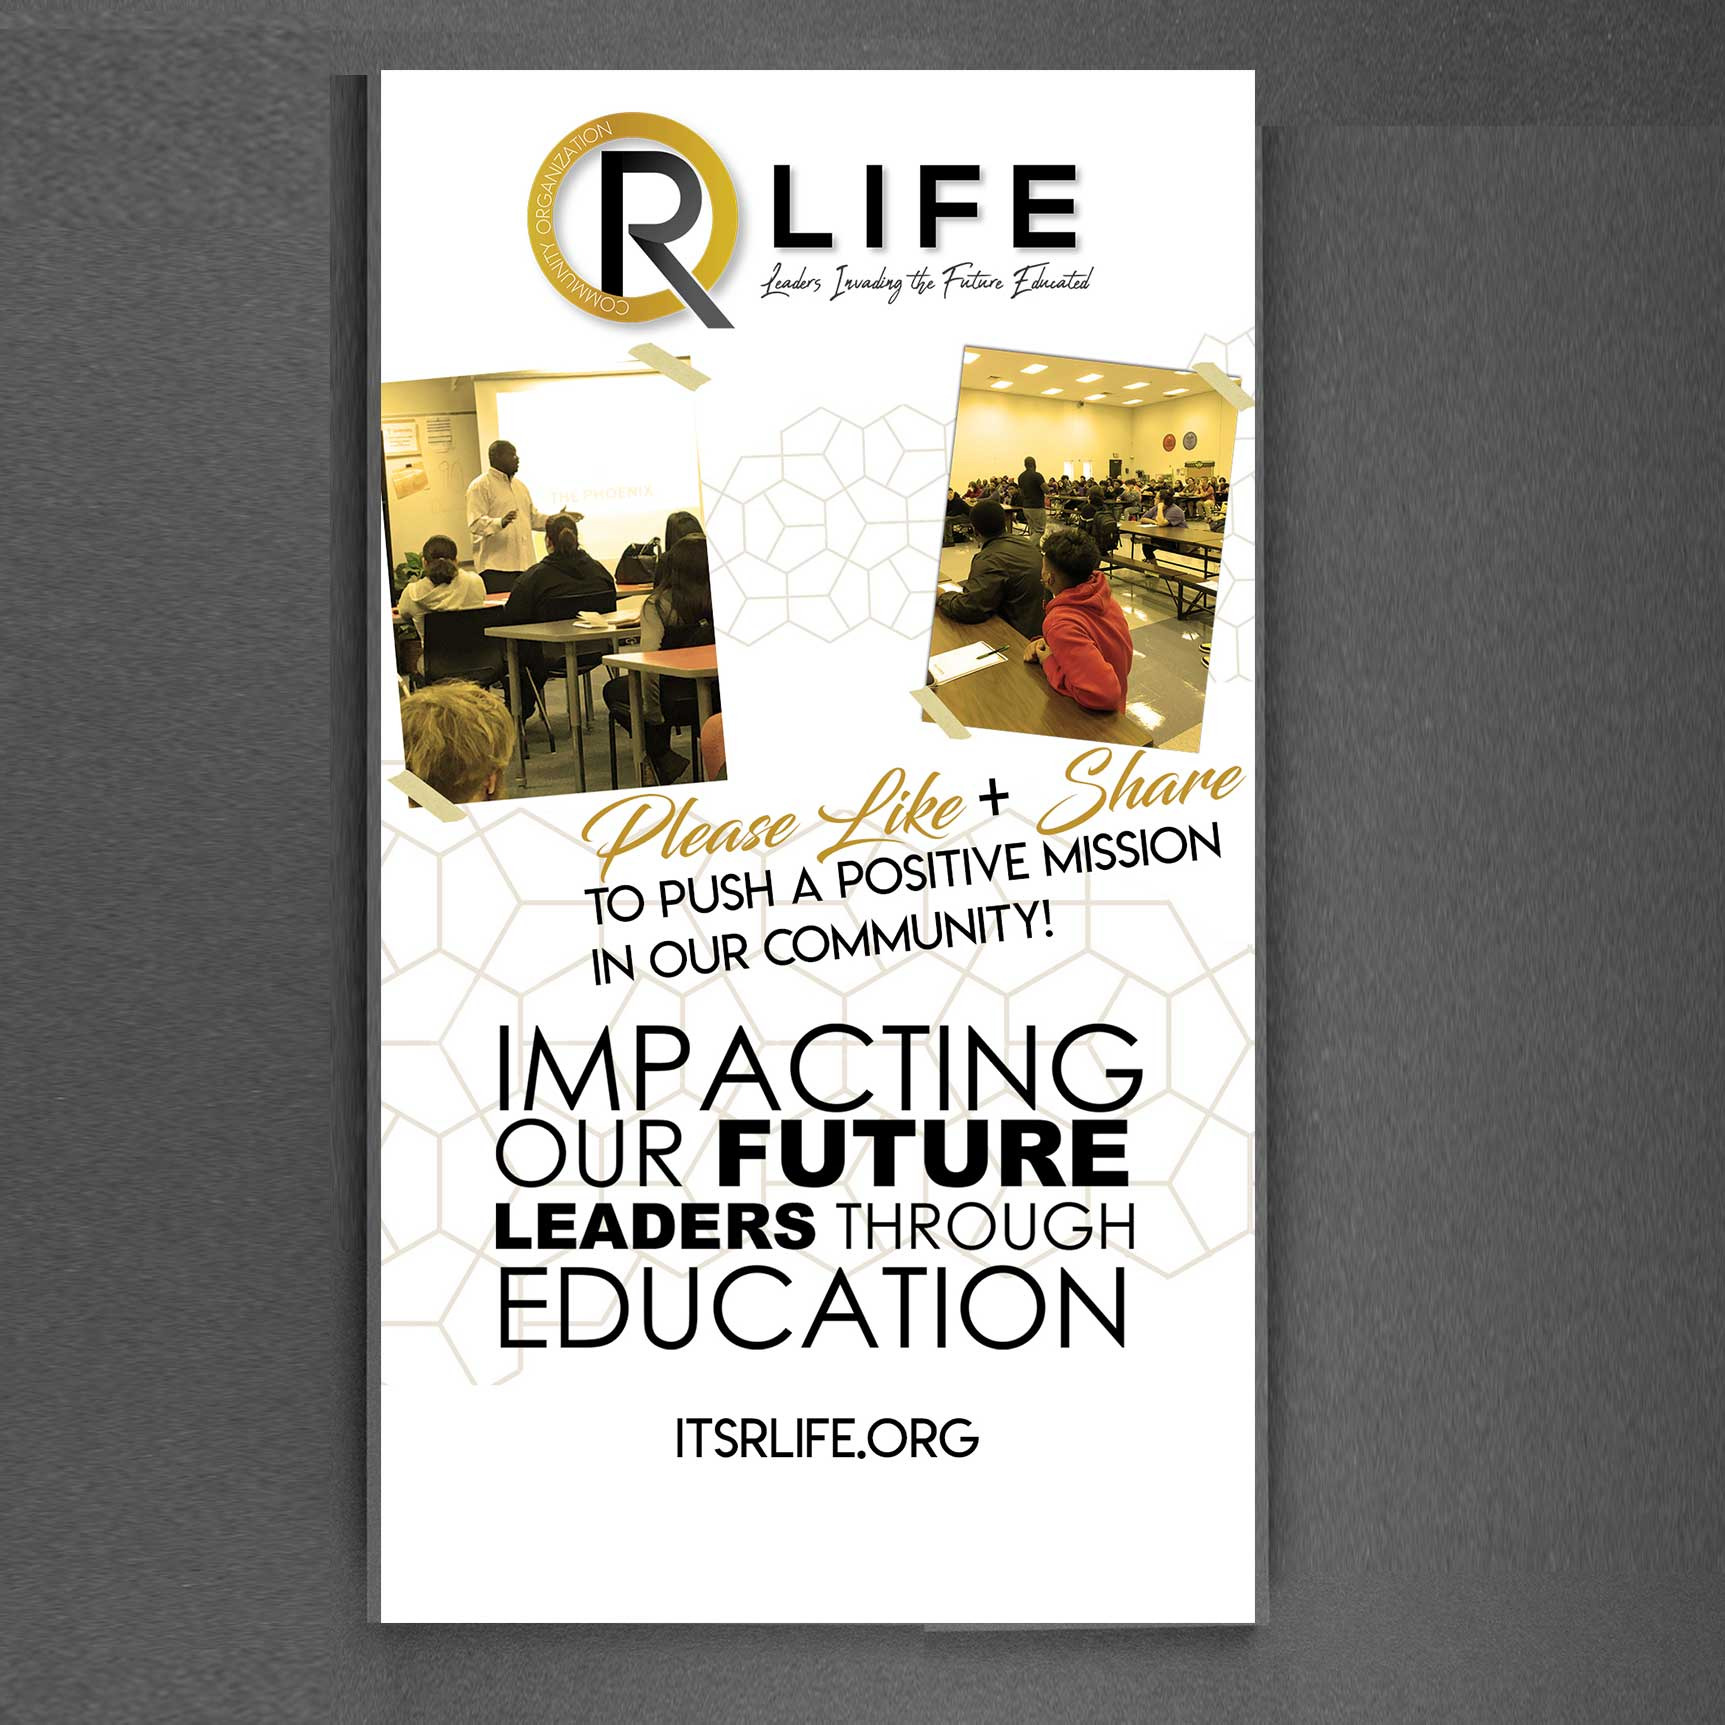 R LIFE Community Organization Non Profit Banner Ad Design